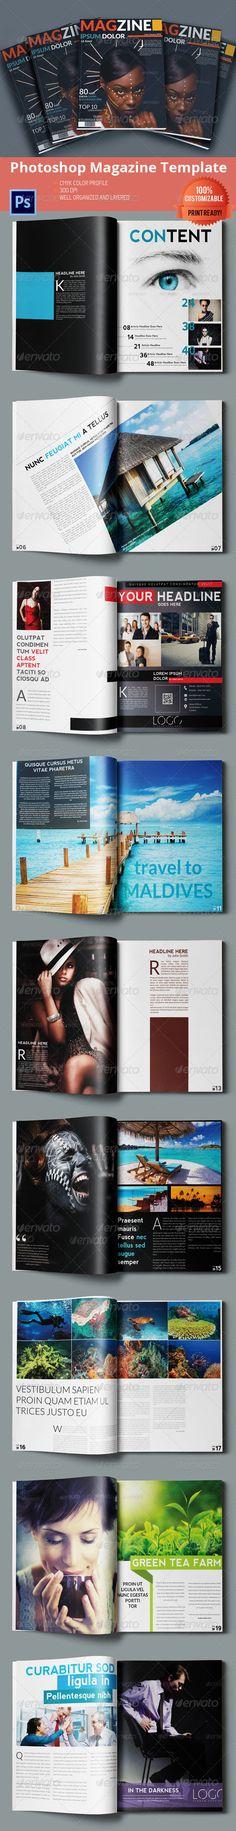 #Multipurpose #Magazine Template - #Photoshop PSD - Magazines #Print #Templates Download here: https://graphicriver.net/item/multipurpose-magazine-template-photoshop-psd/6405338?ref=alena994